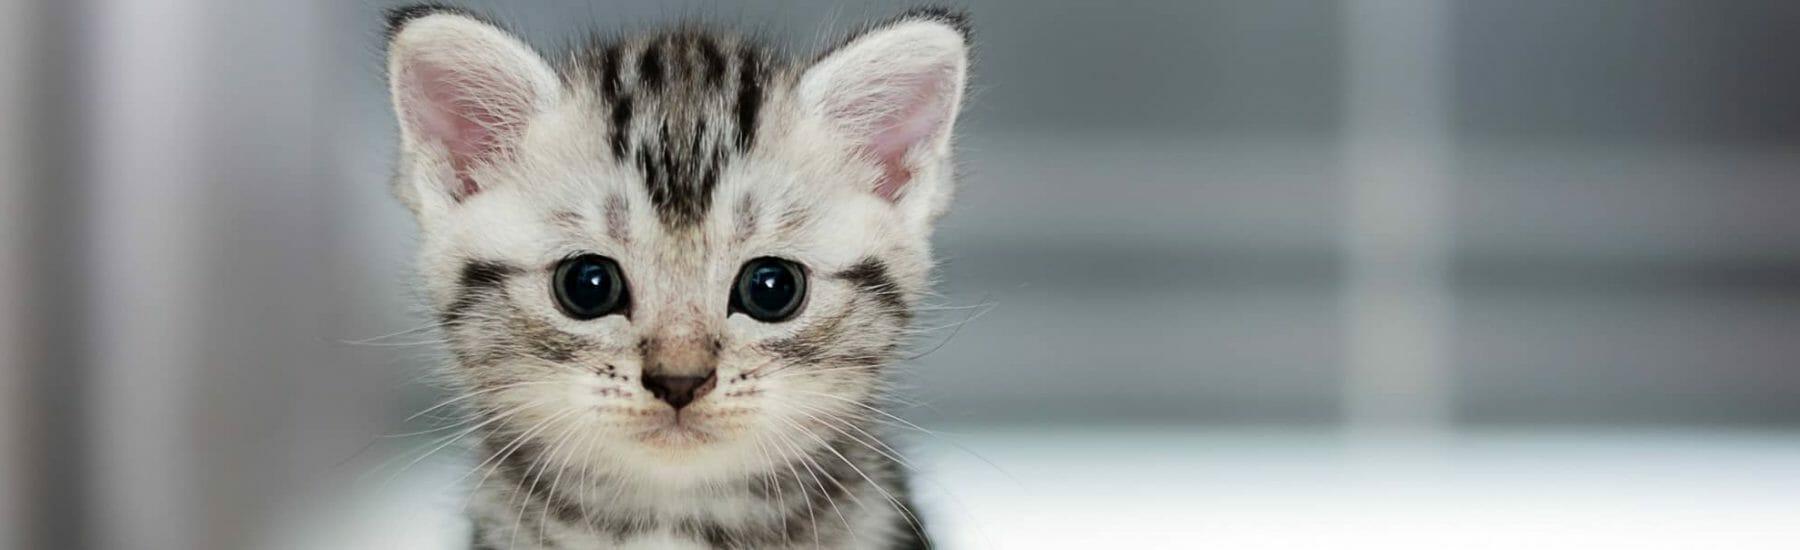 Cat General